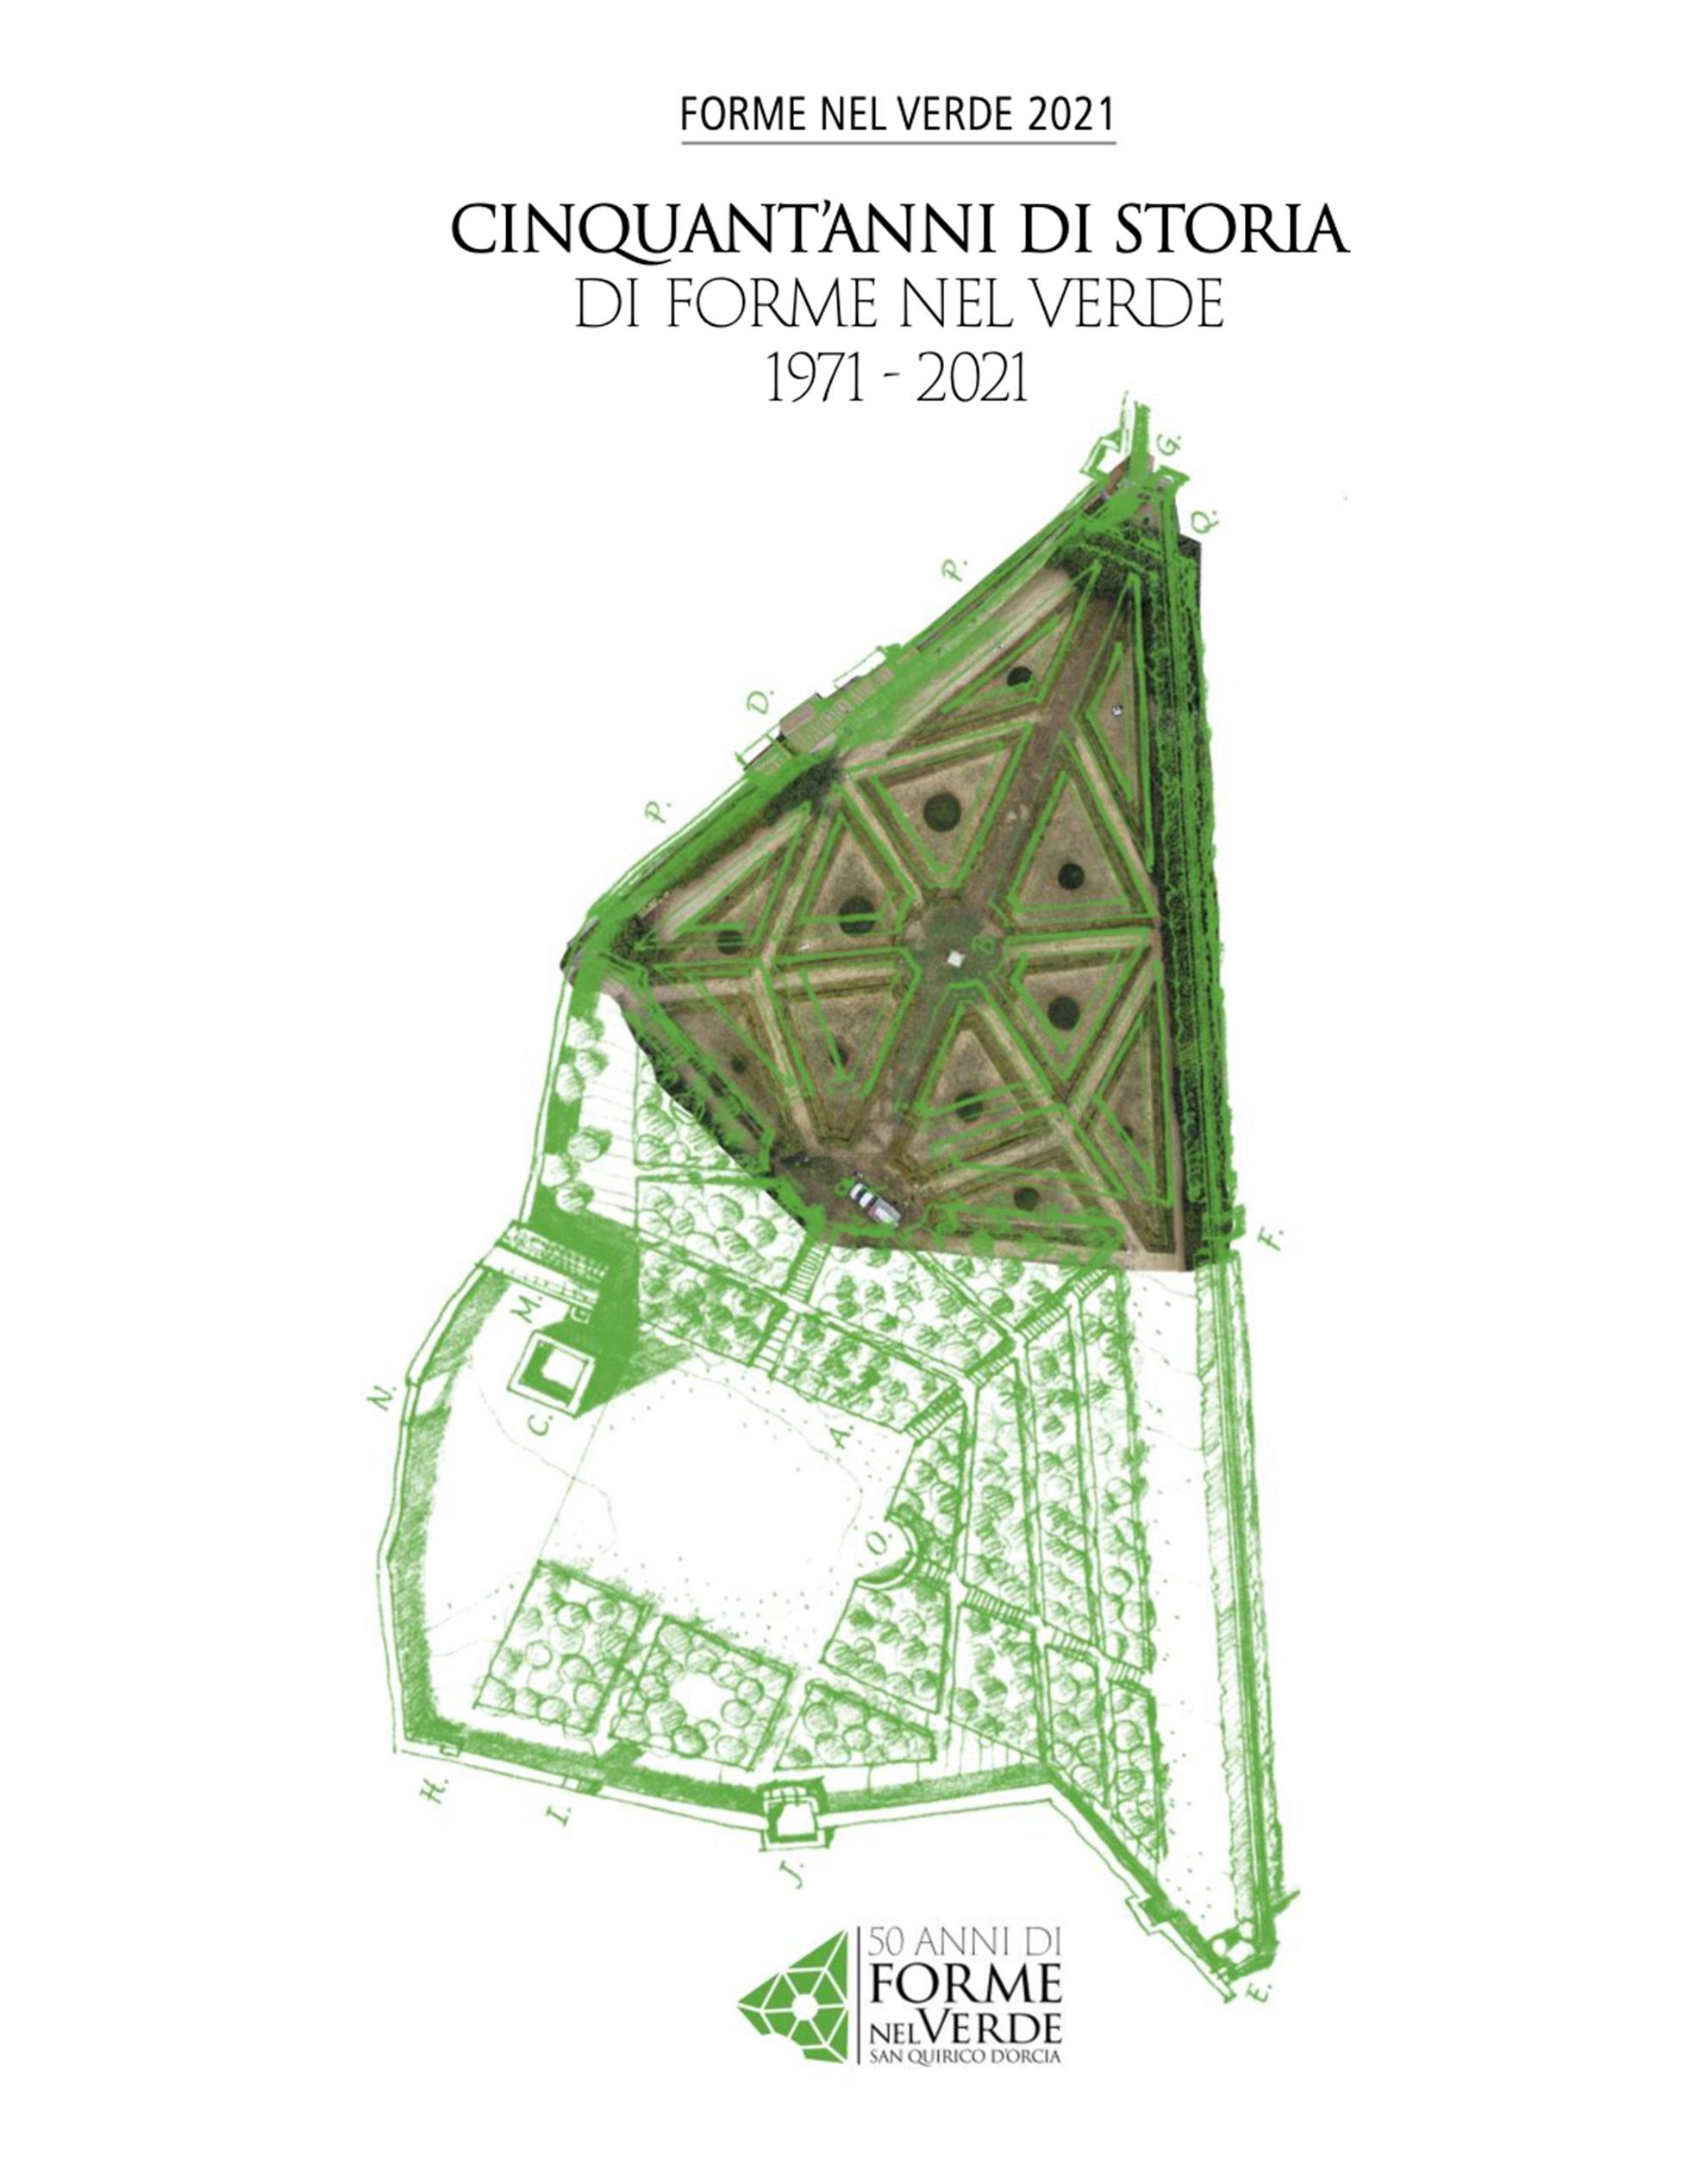 Catalogo Forme nel Verde 2021